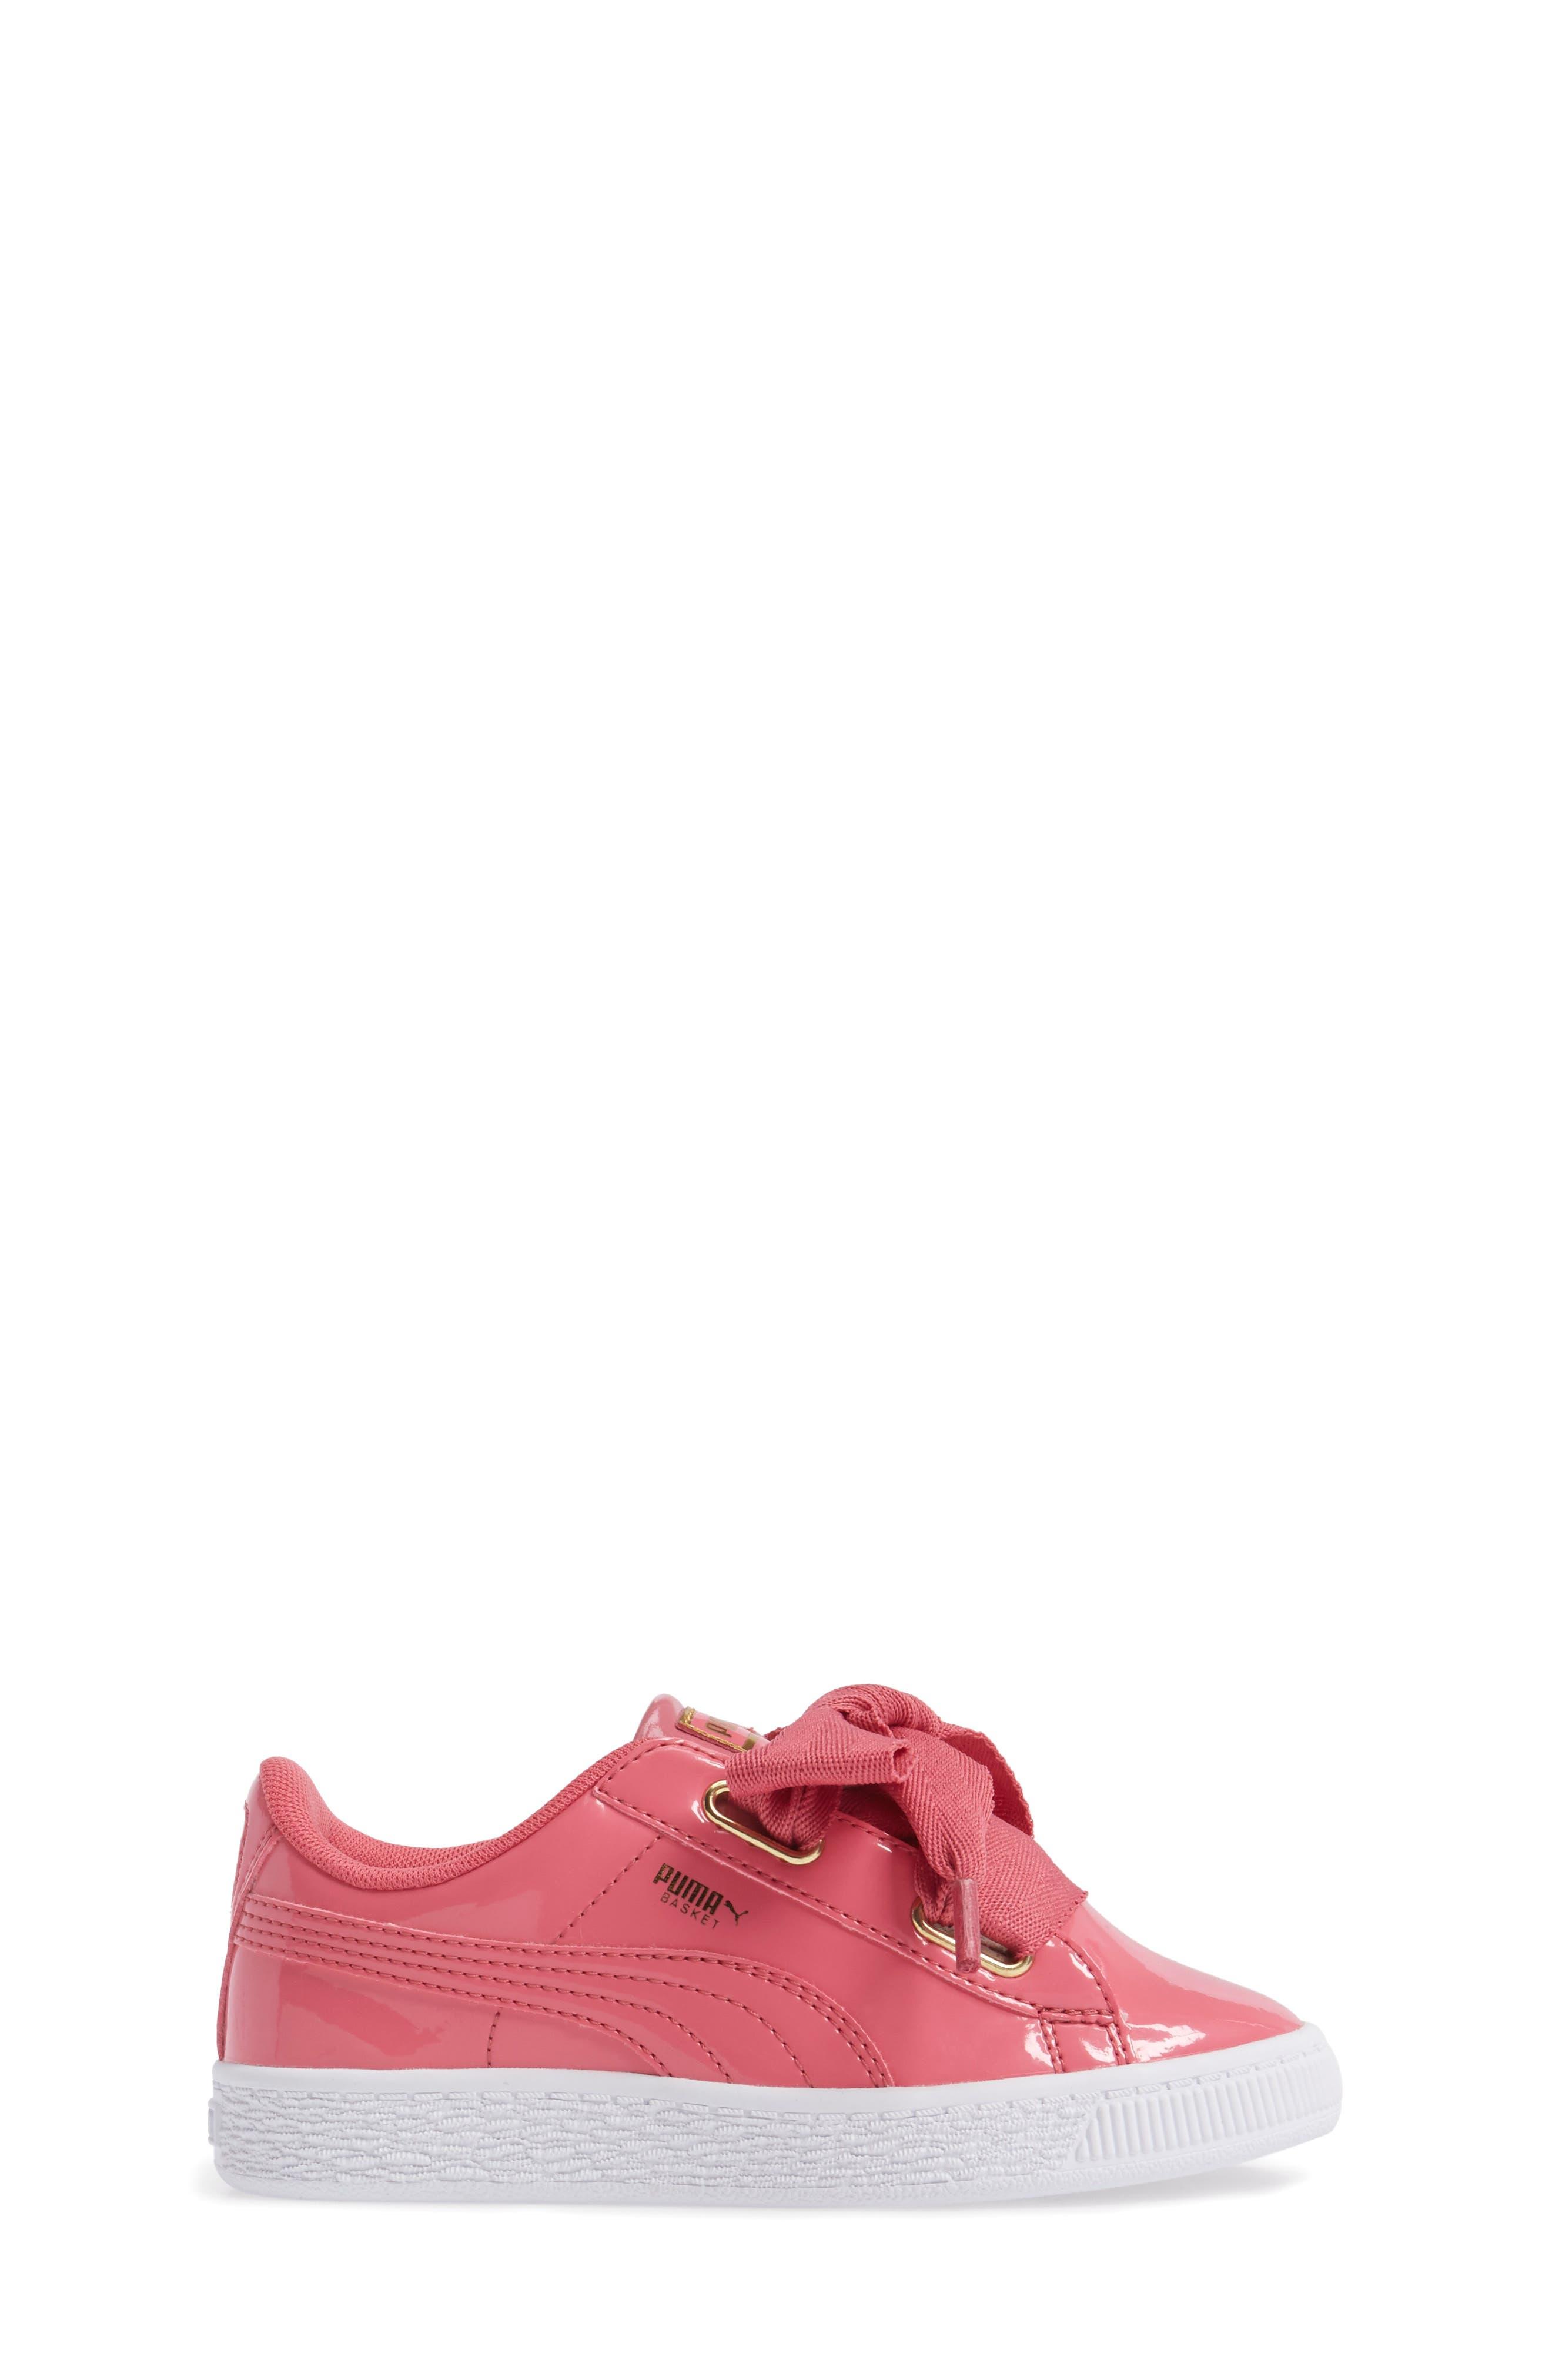 Basket Heart Sneaker,                             Alternate thumbnail 3, color,                             Rapture Rose/ Puma Team Gold